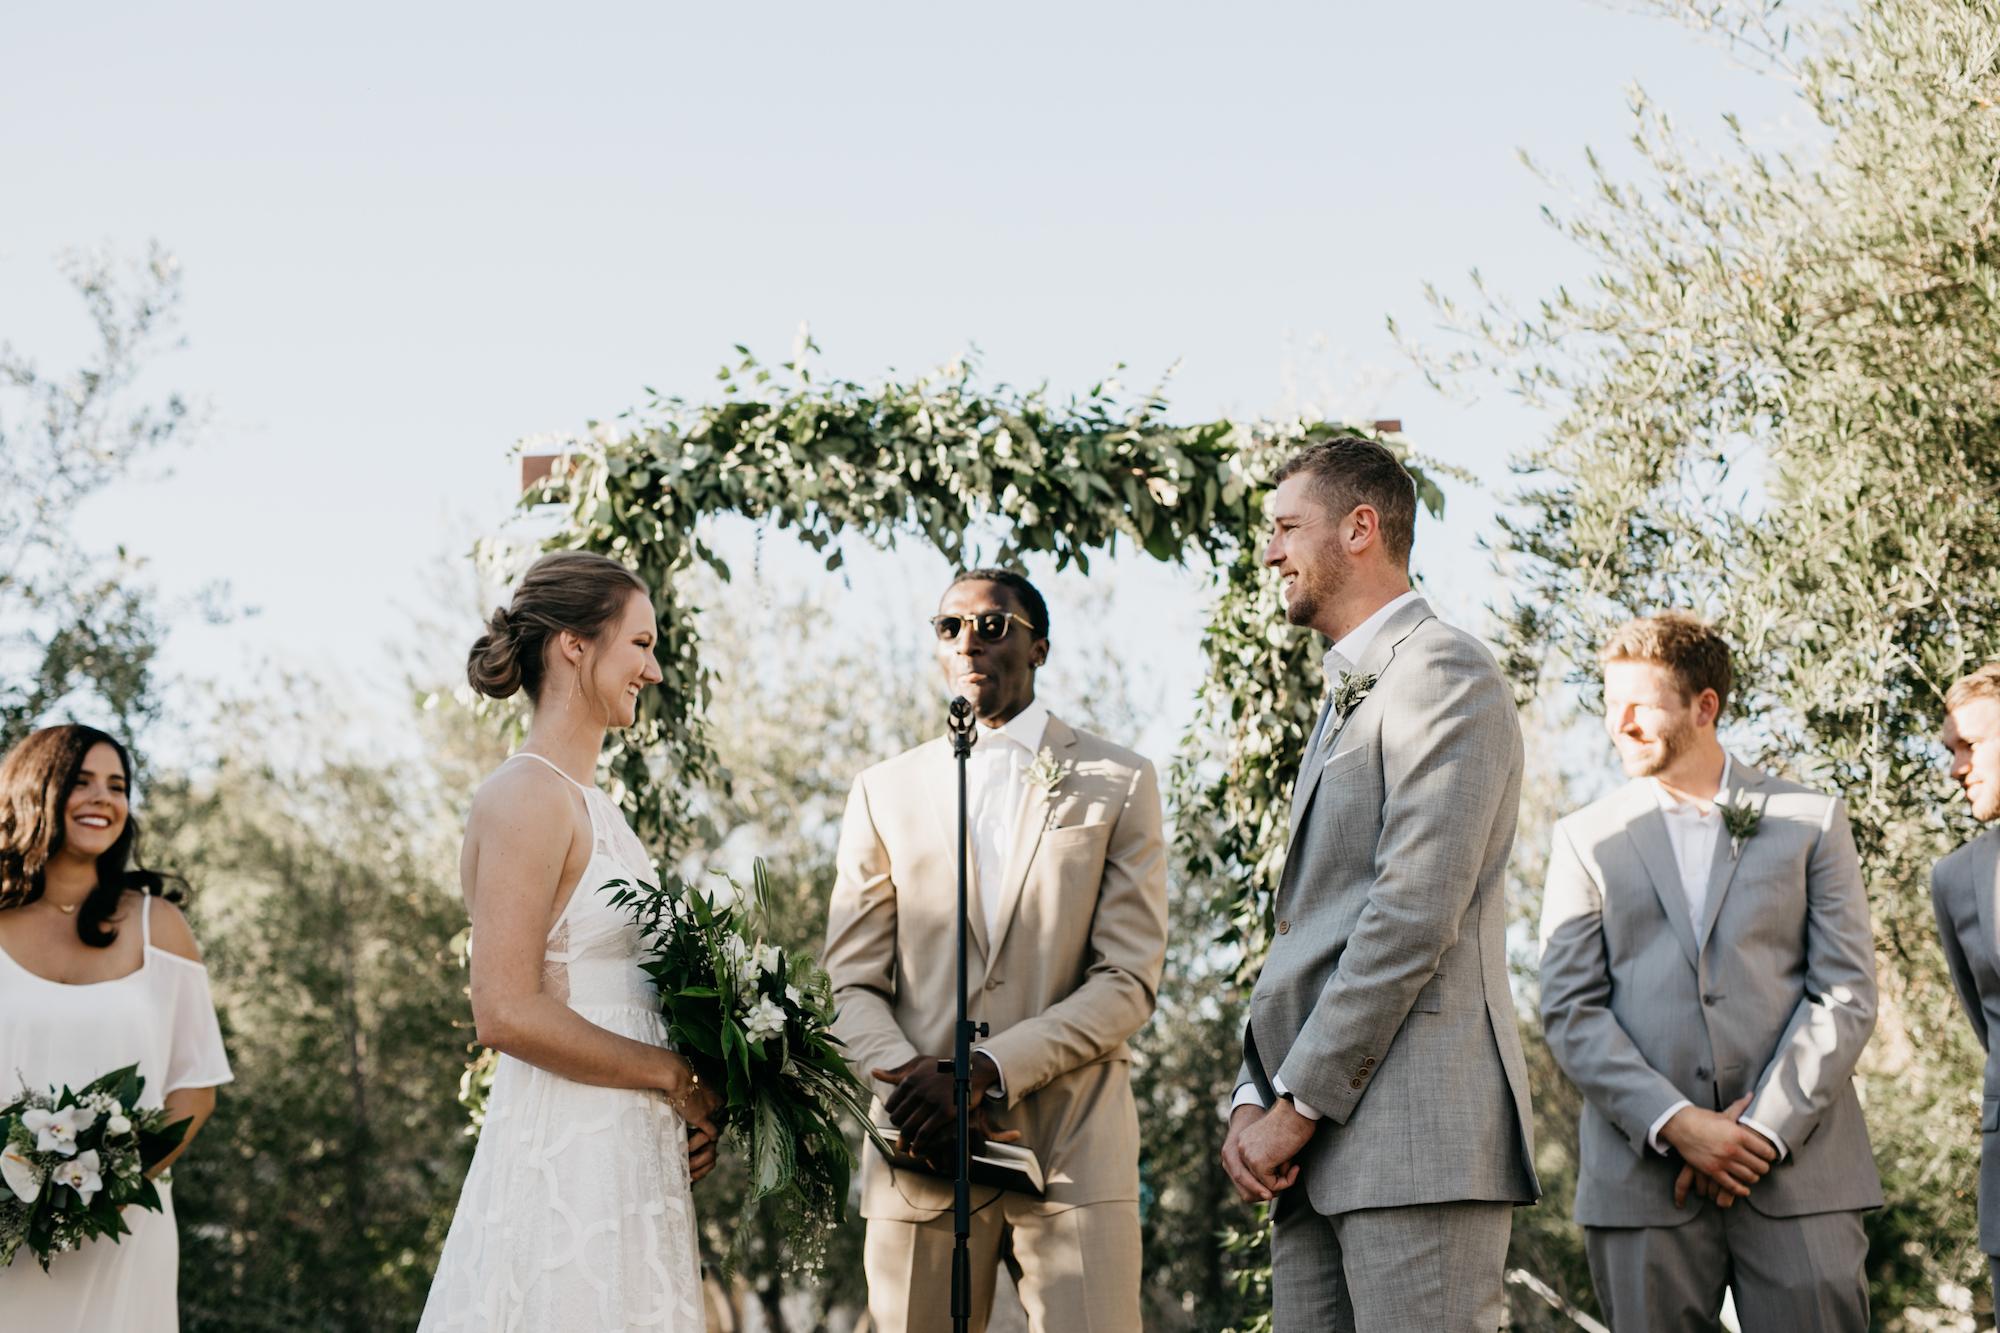 ace-hotel-palm-springs-wedding-photographer525.jpg